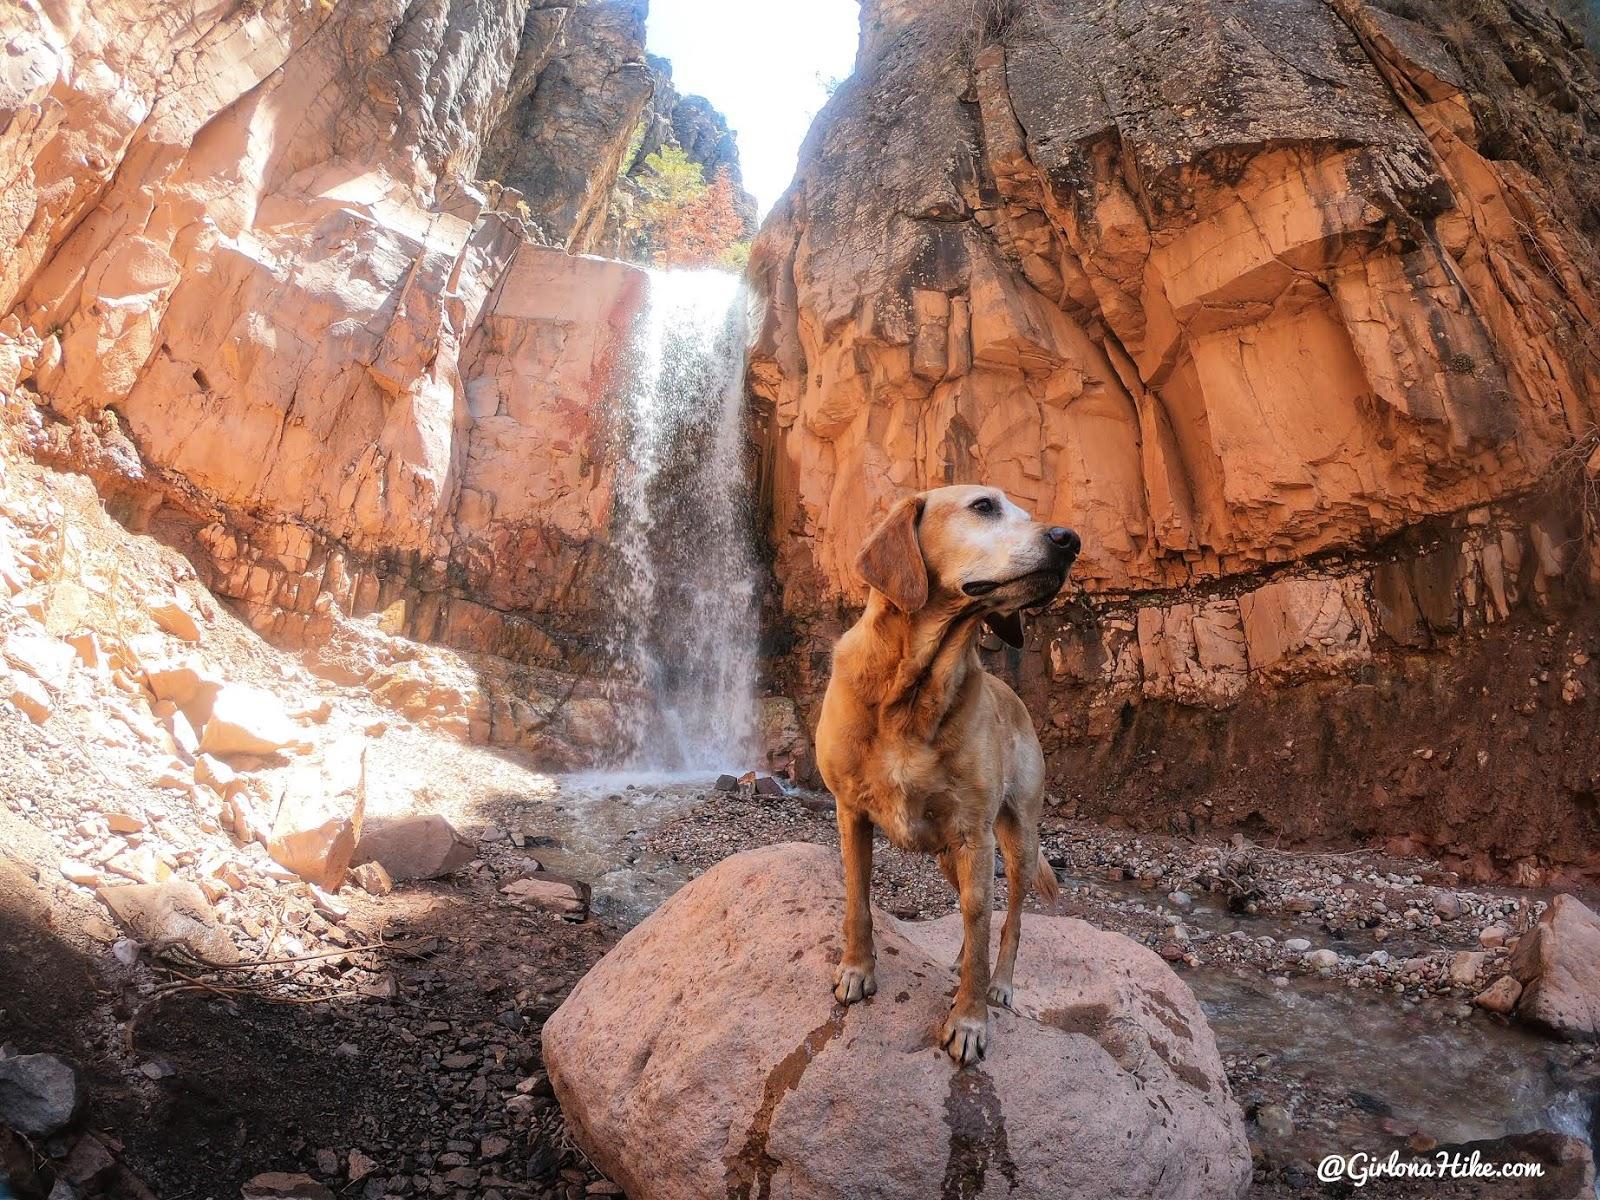 Hiking to the Hidden Haven Waterfall, Parowan, Utah waterfall, Brian Head waterfall, waterfalls in utah, waterfalls in southern utah, dog friendly utah waterfalls